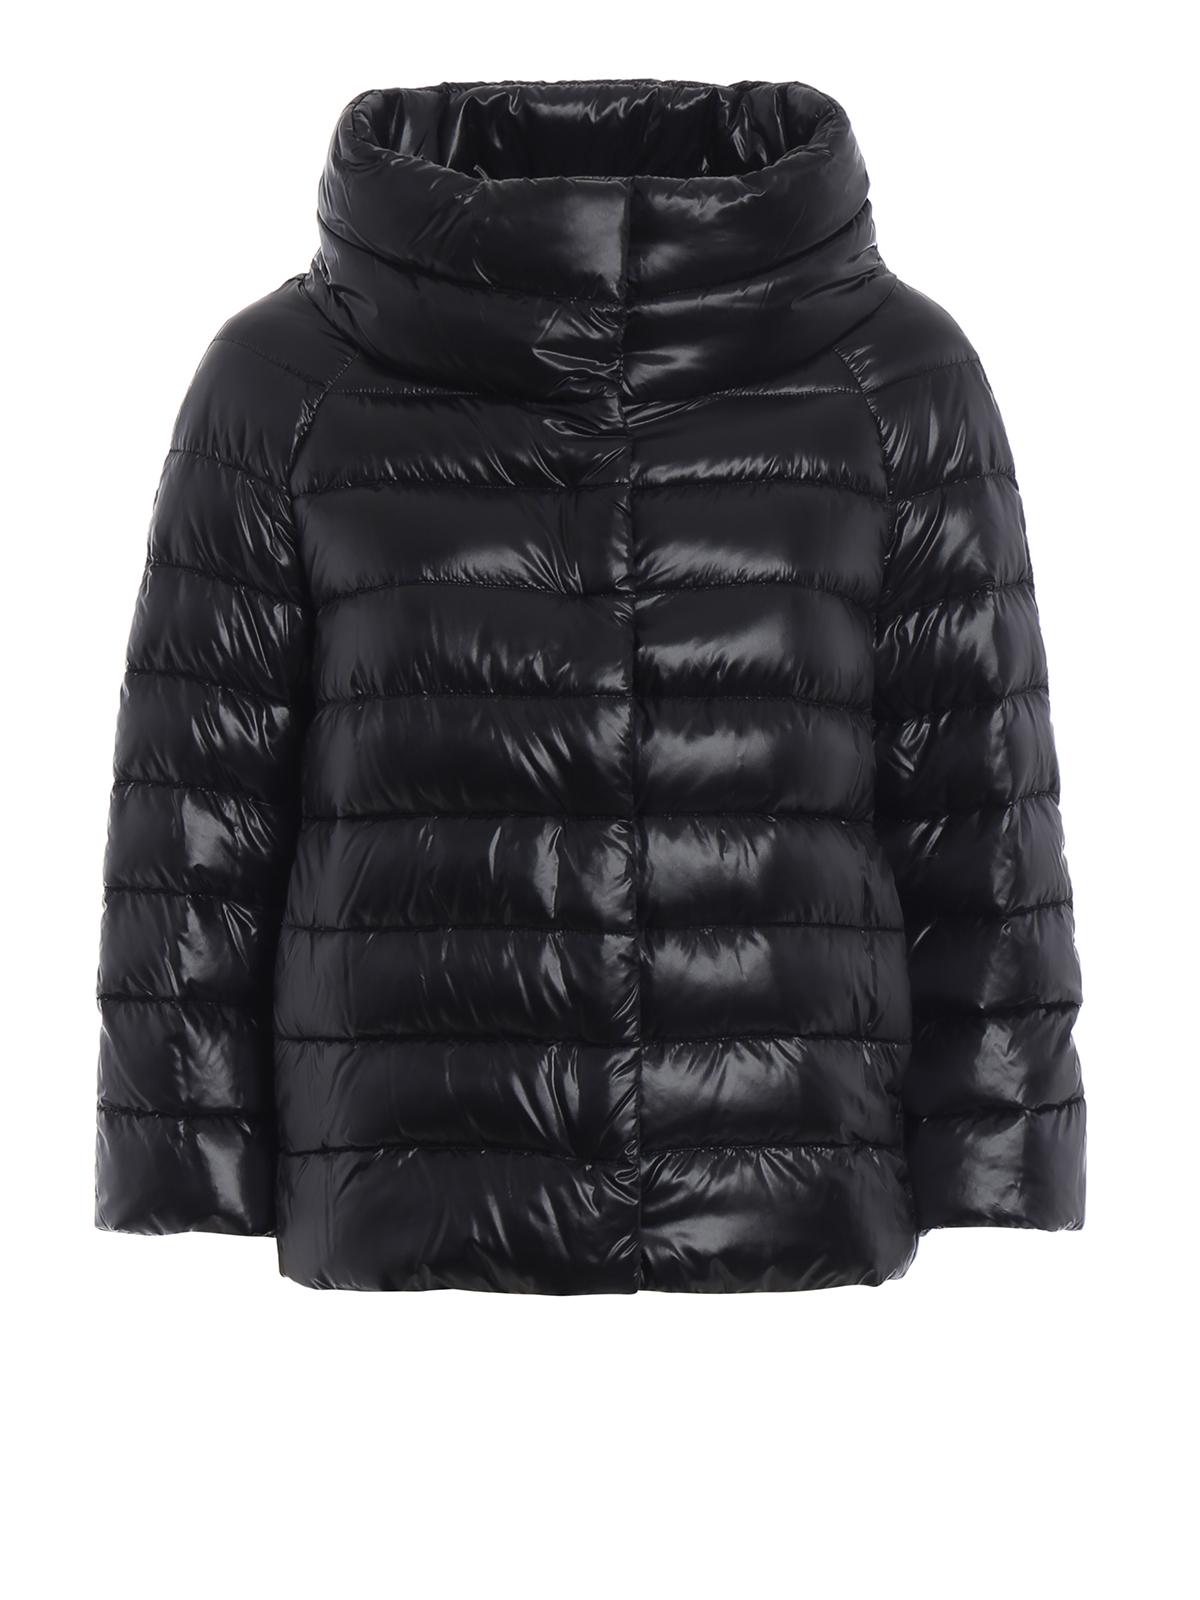 181d362b51 Herno - Piumino Sofia in nylon nero - giacche imbottite ...